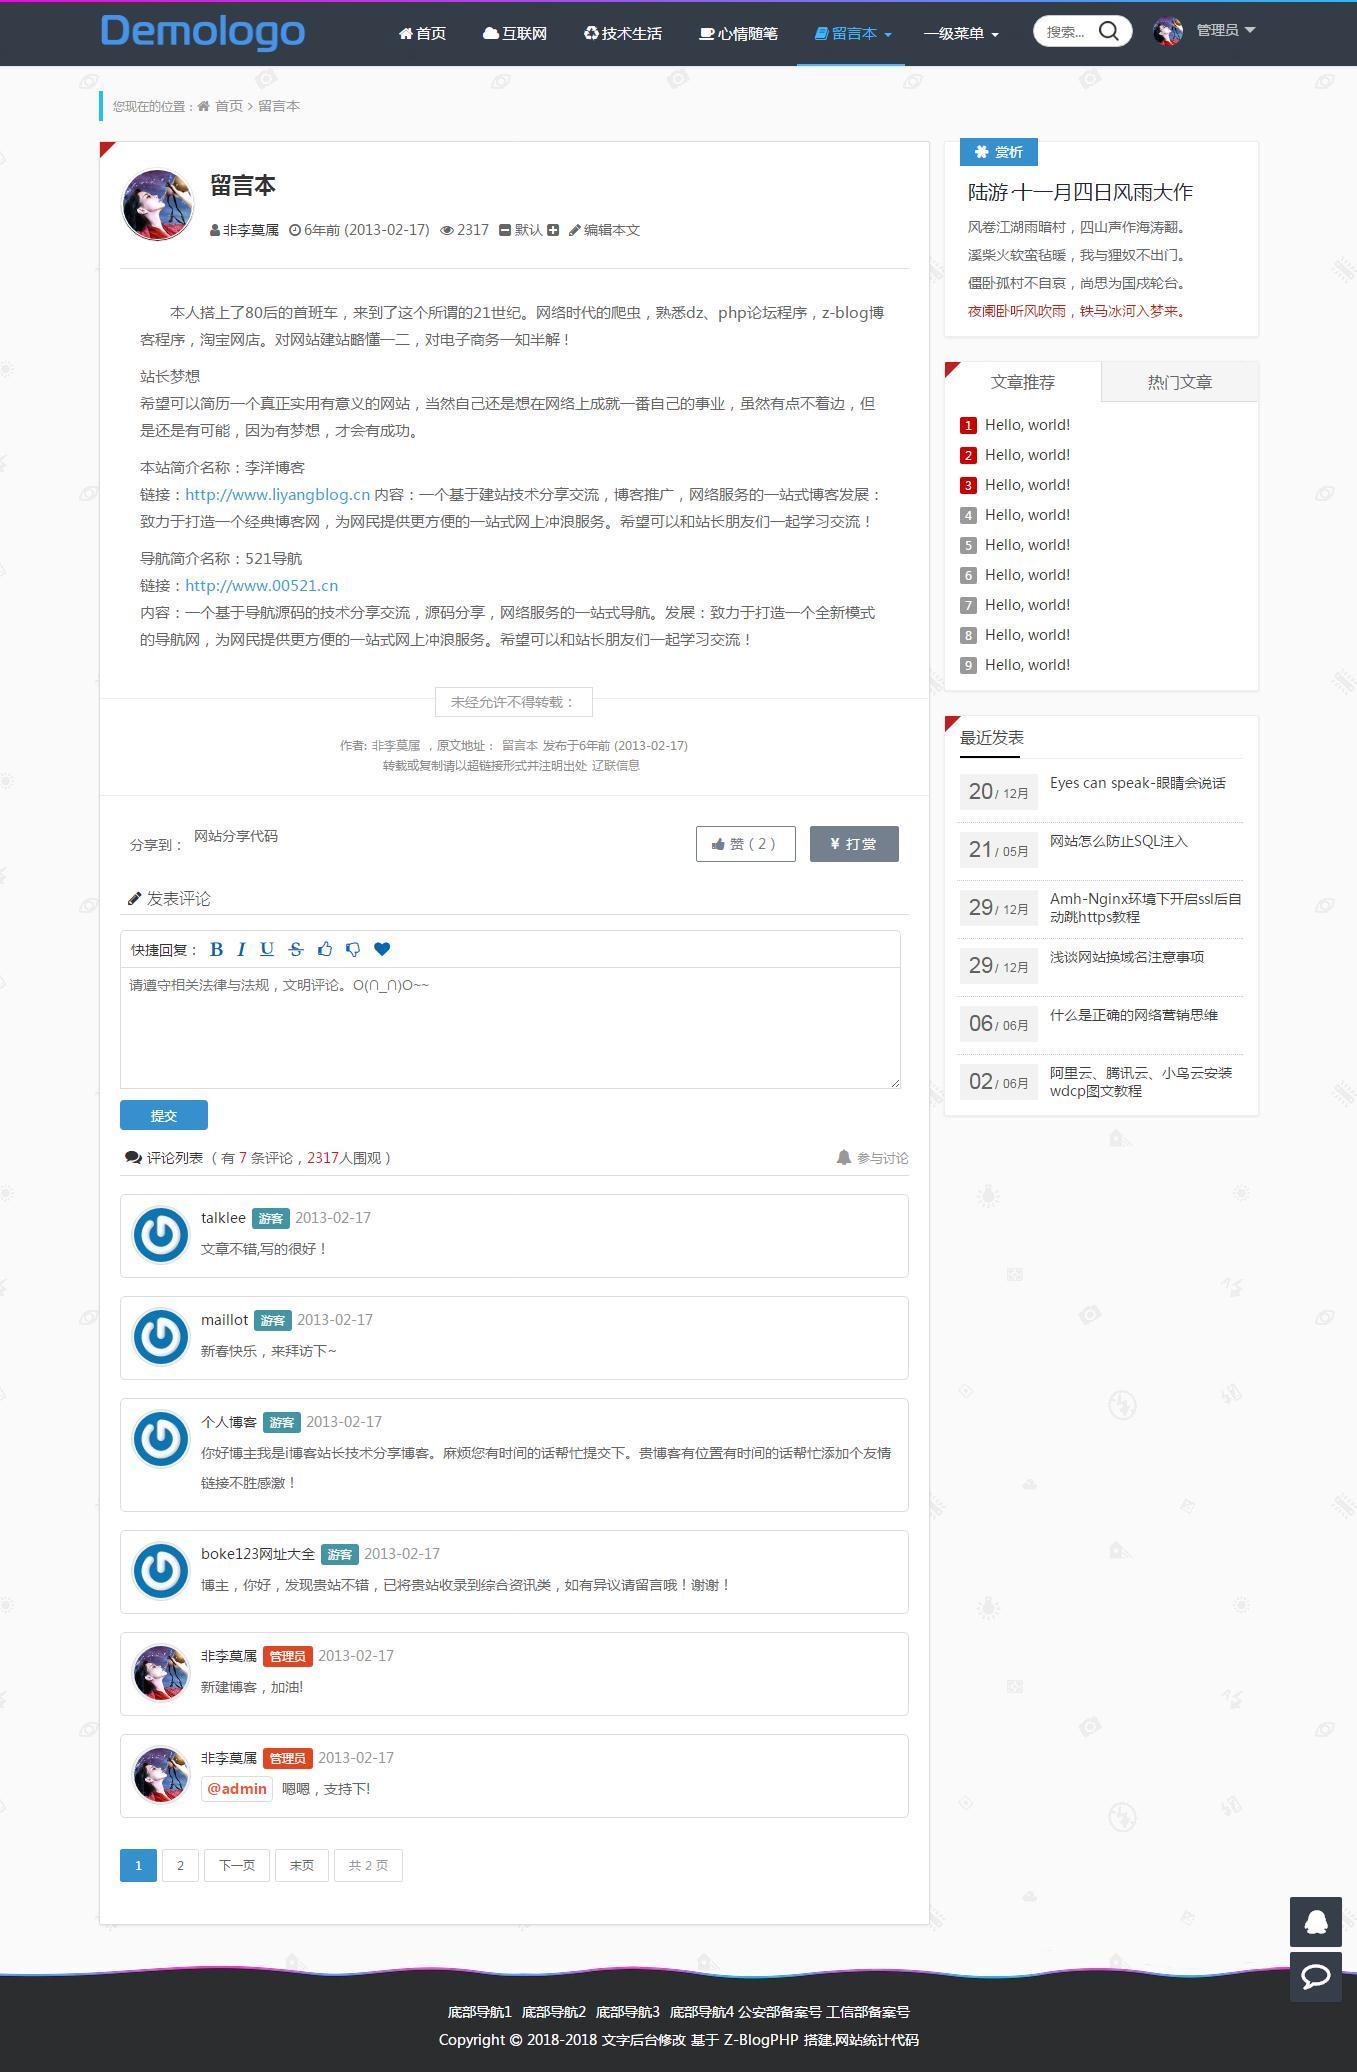 Z-BlogPHP旗舰主题开运锦鲤前来报道,Z-BlogPHP开运锦鲤前来报道(更新说明及操作教程,必看文章) 第82张,博客模板,免费,教程,资源,php,模板,QQ,第90张